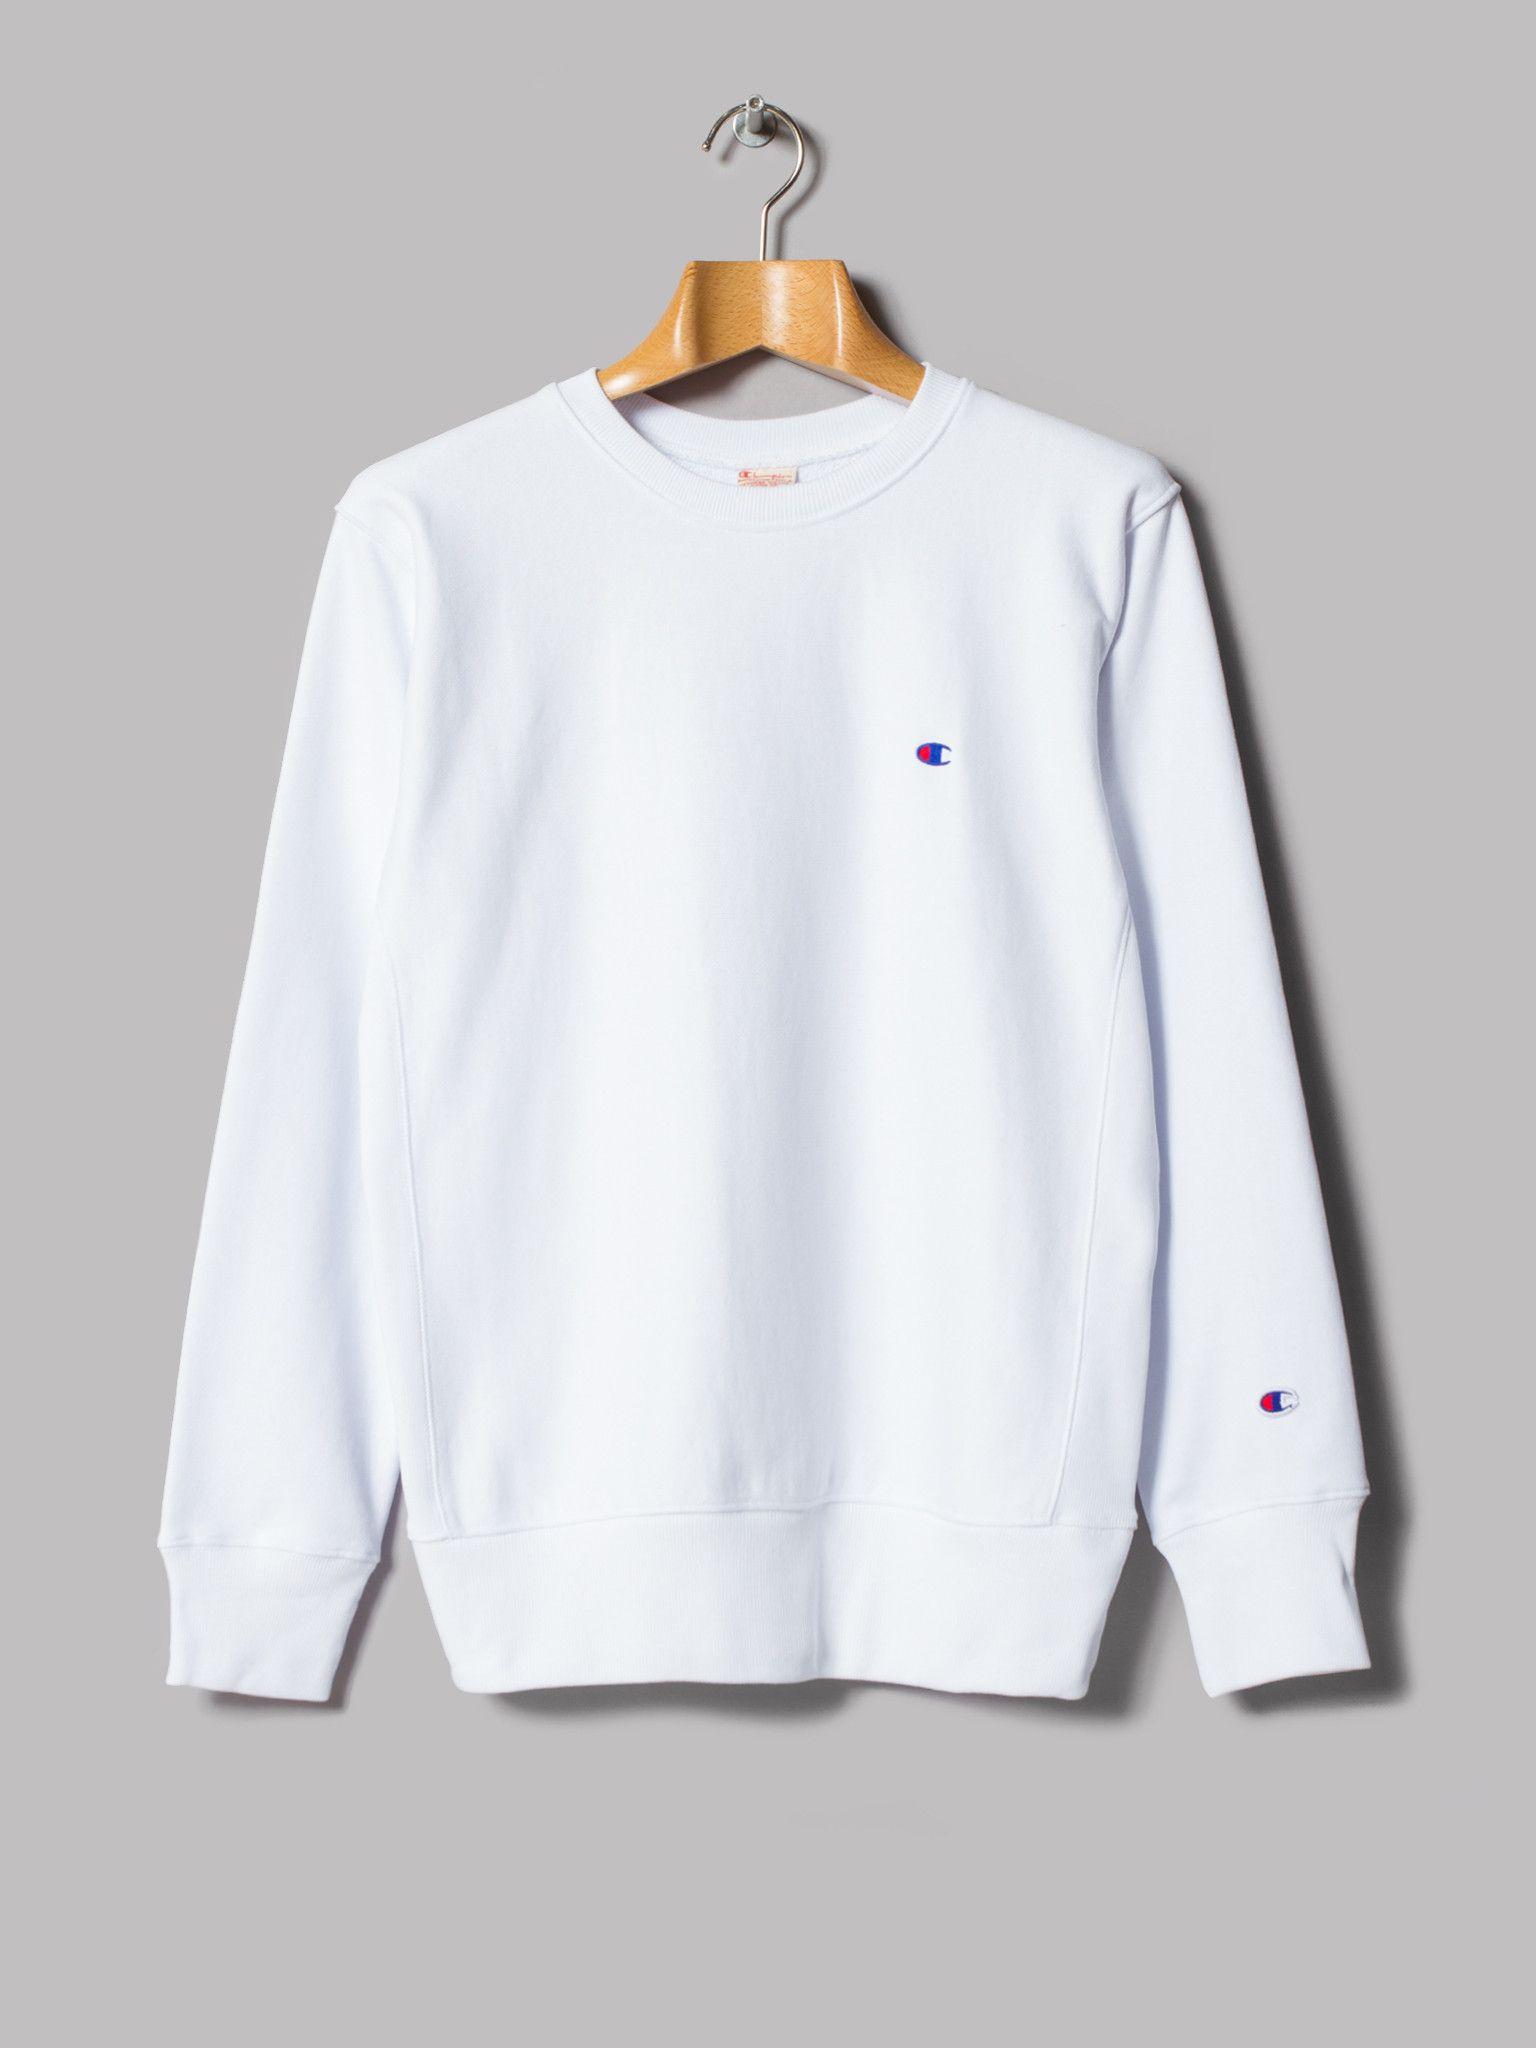 1ef847e3b529b7 Champion Reverse Weave Crewneck Sweatshirt (White)